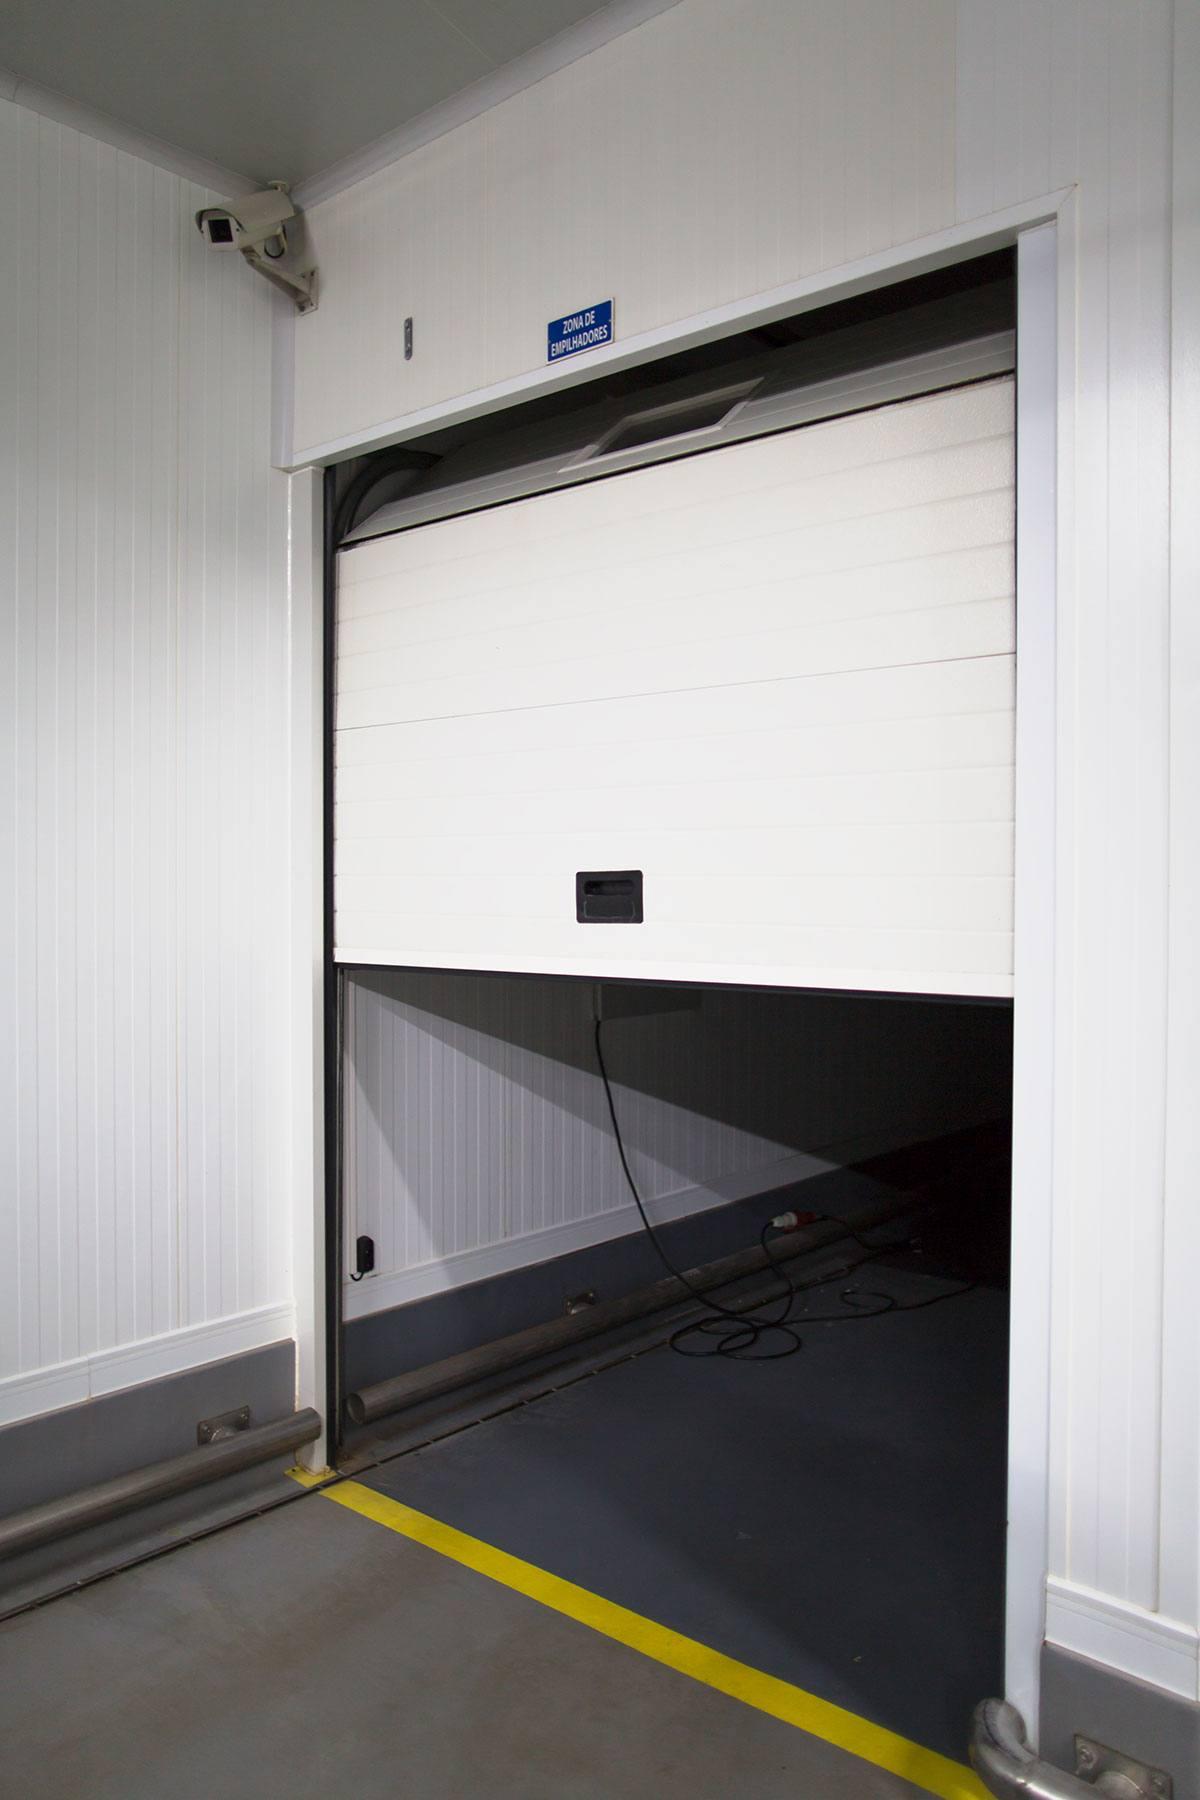 Puerta industrial seccional abhdocksolutions for Puerta industrial